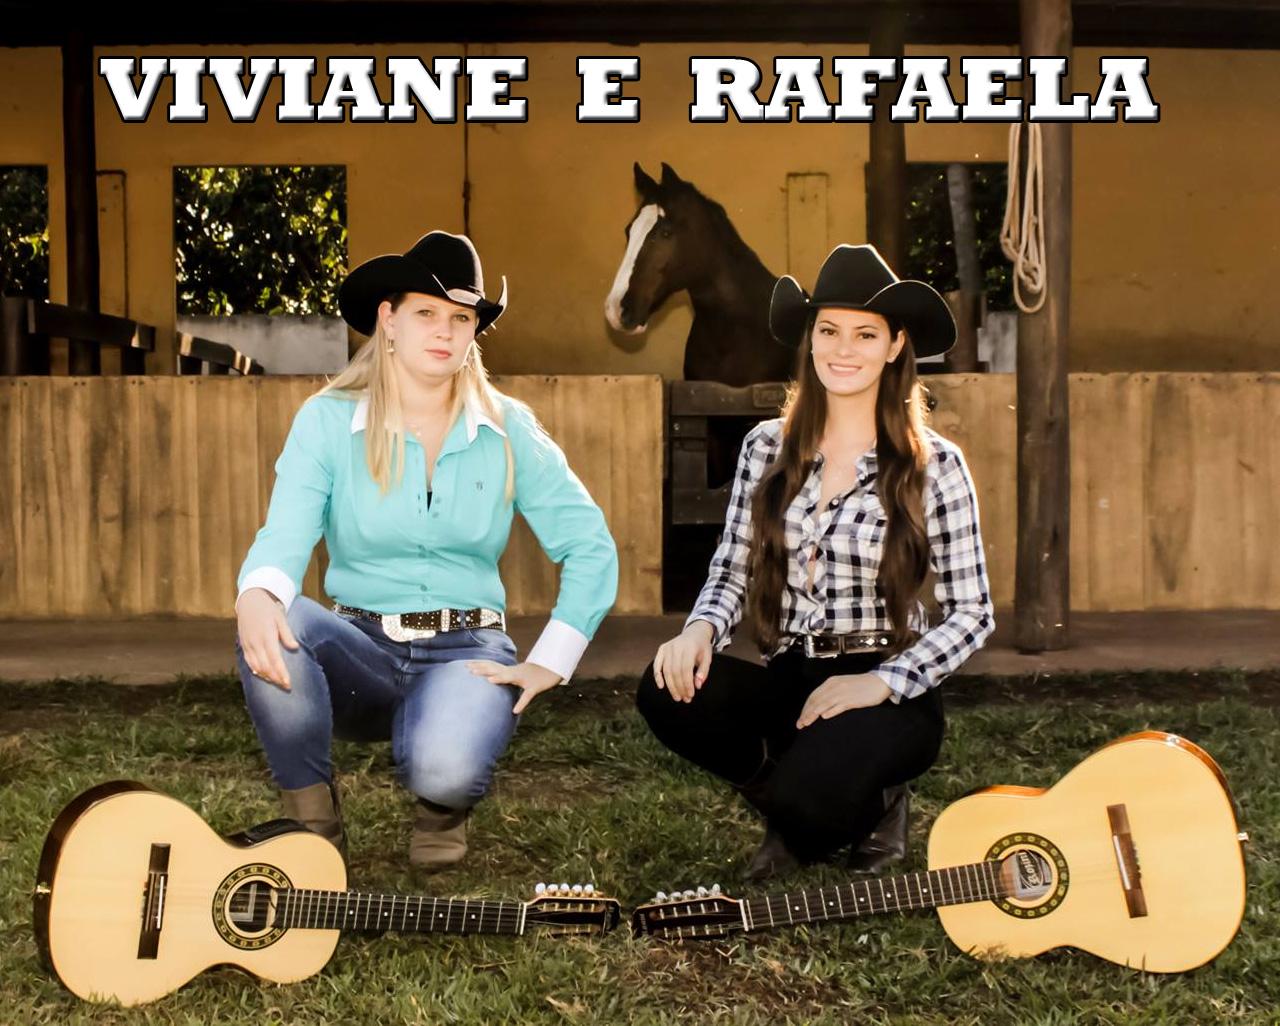 VIVIANE E RAFAELA